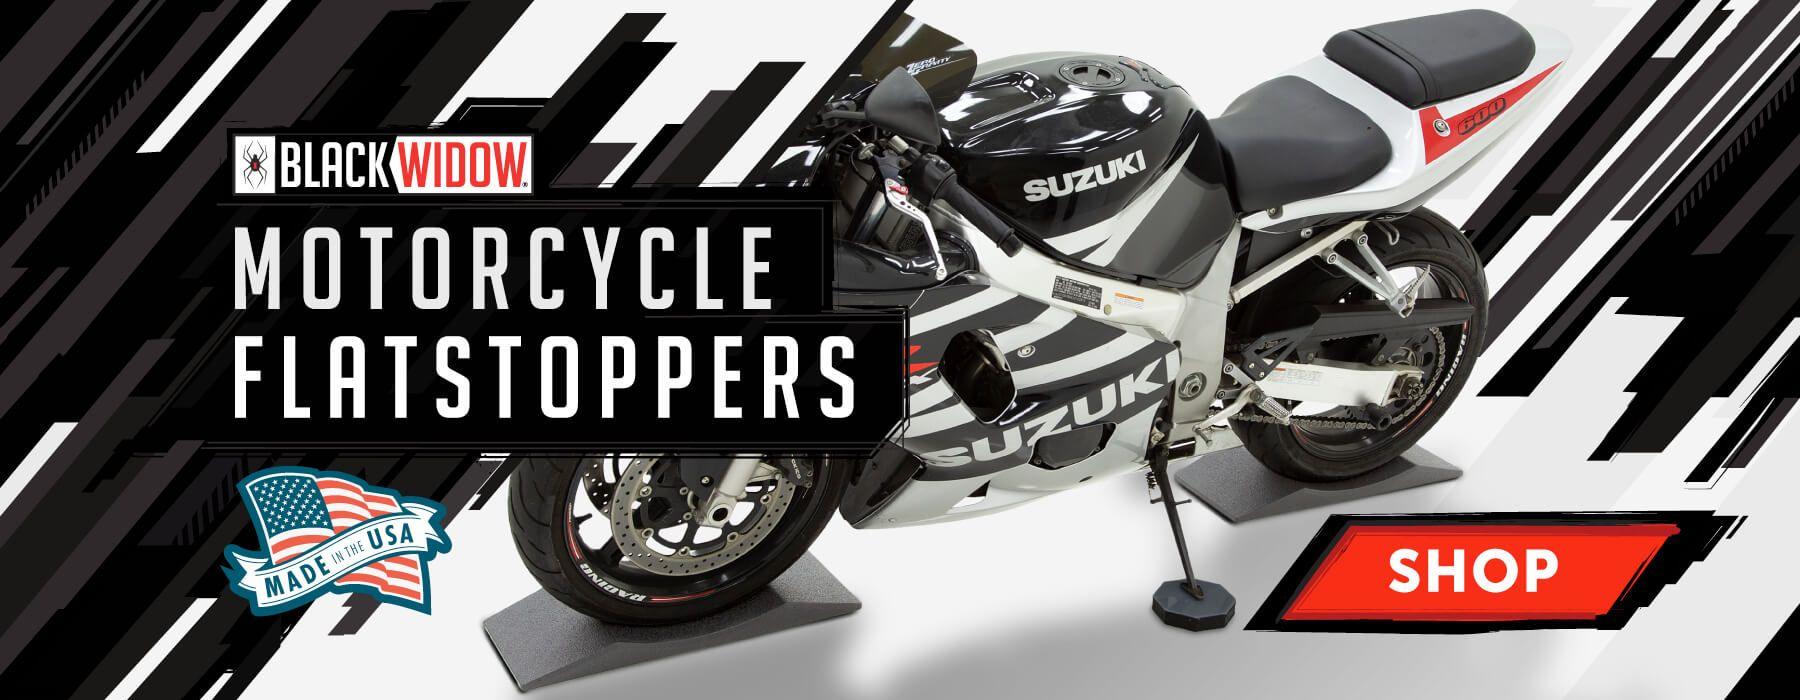 Shop Motorcycle FlatStoppers